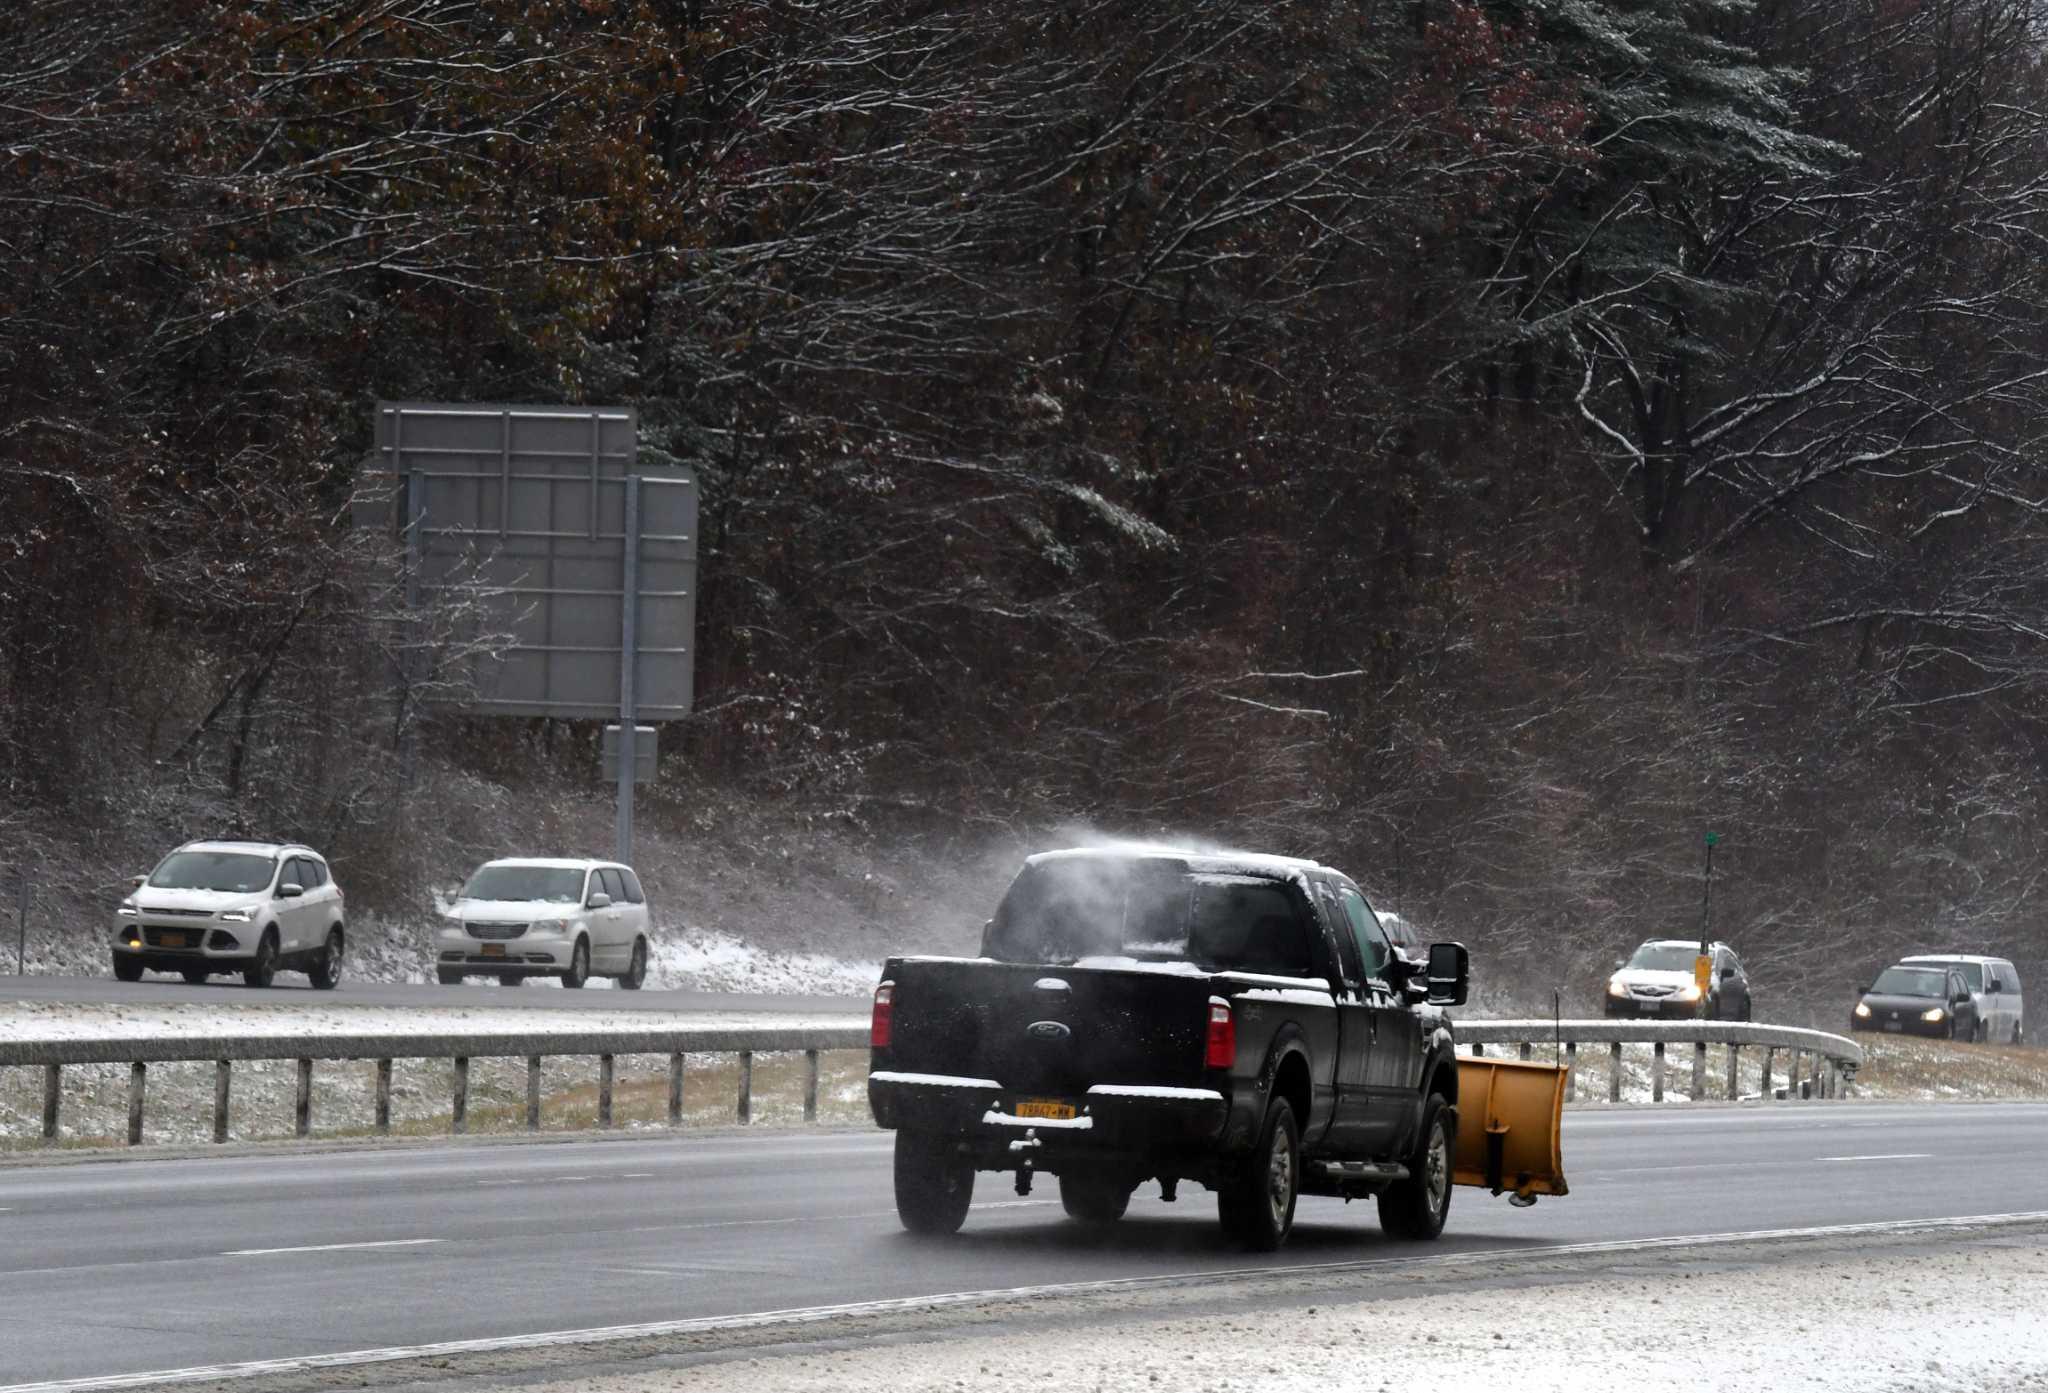 Jason Gough's forecast: Watch out for freezing rain on Monday